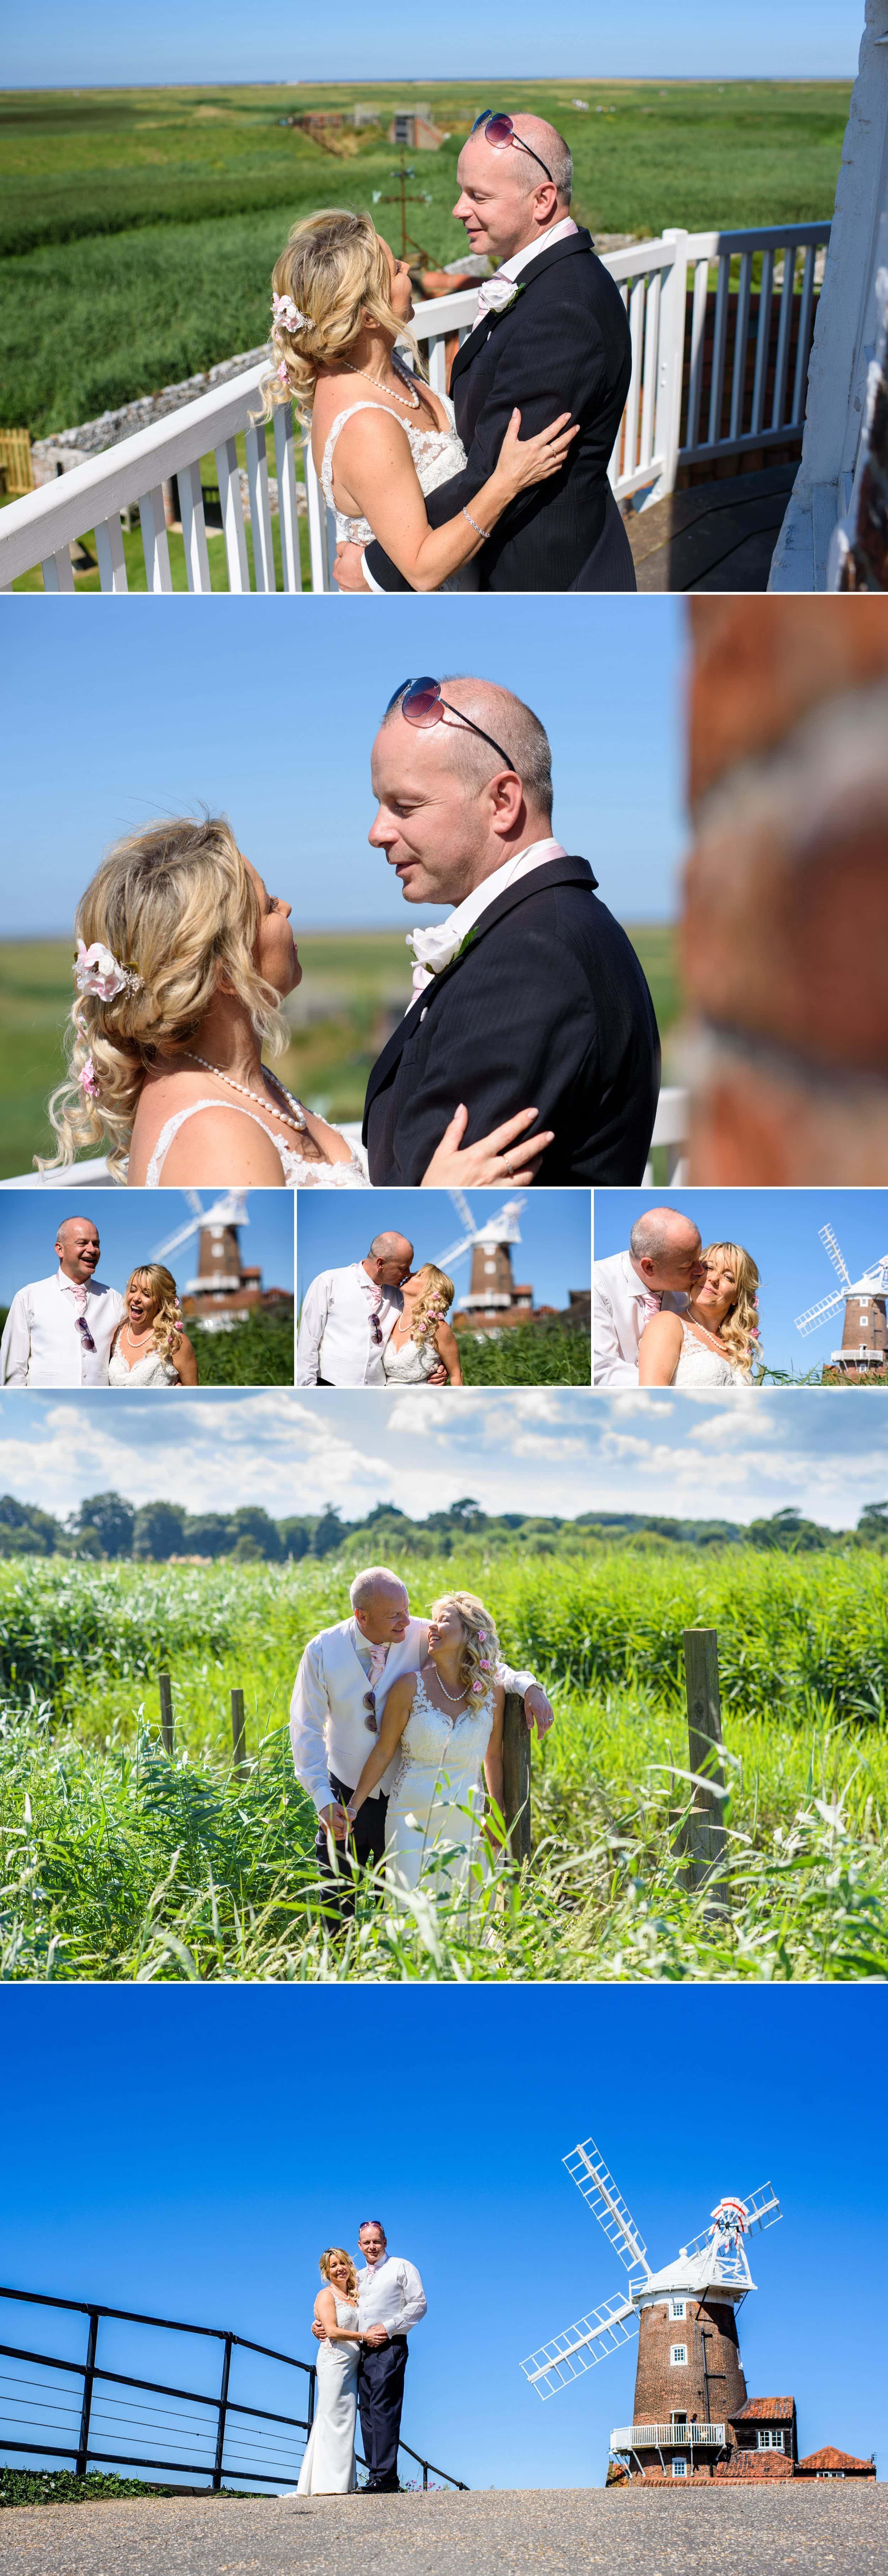 cley_windmill_norfolk_wedding_photography-12